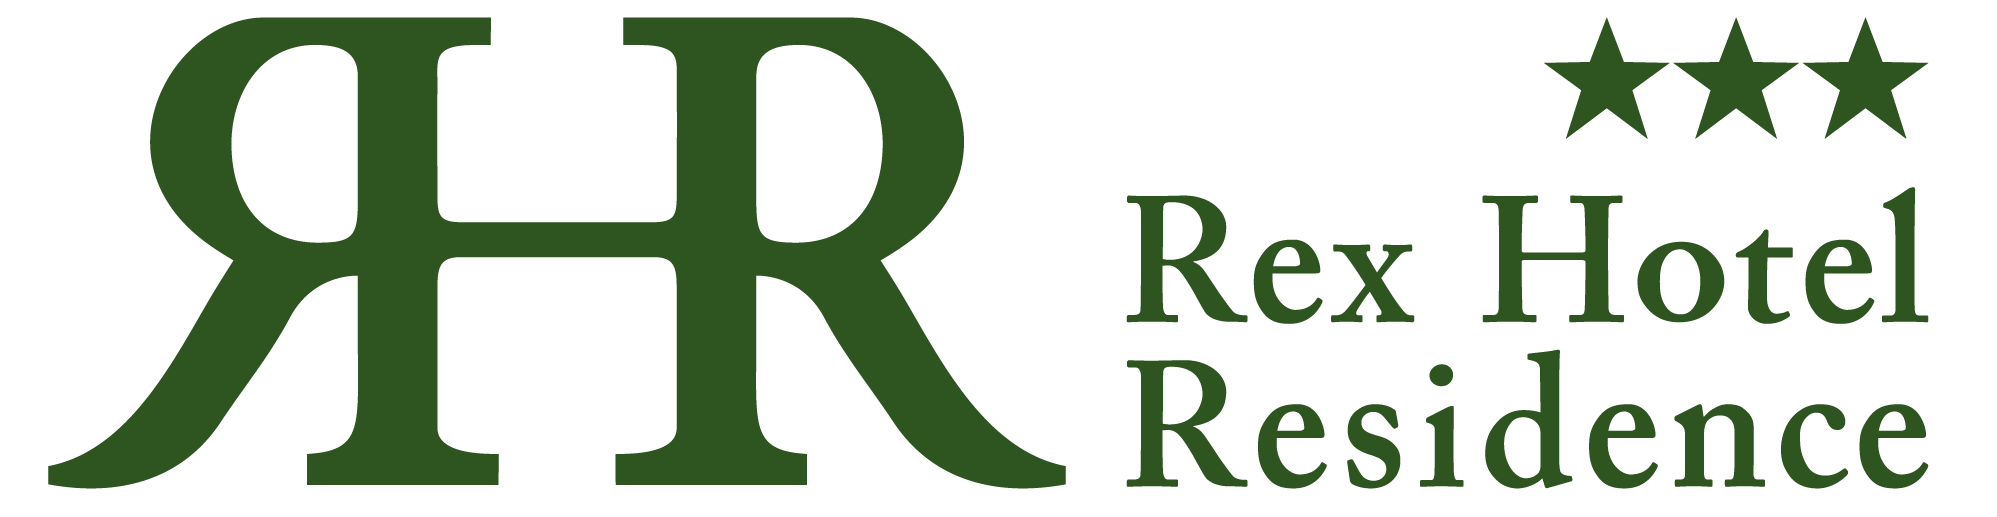 Rex Hotel Residence Logo